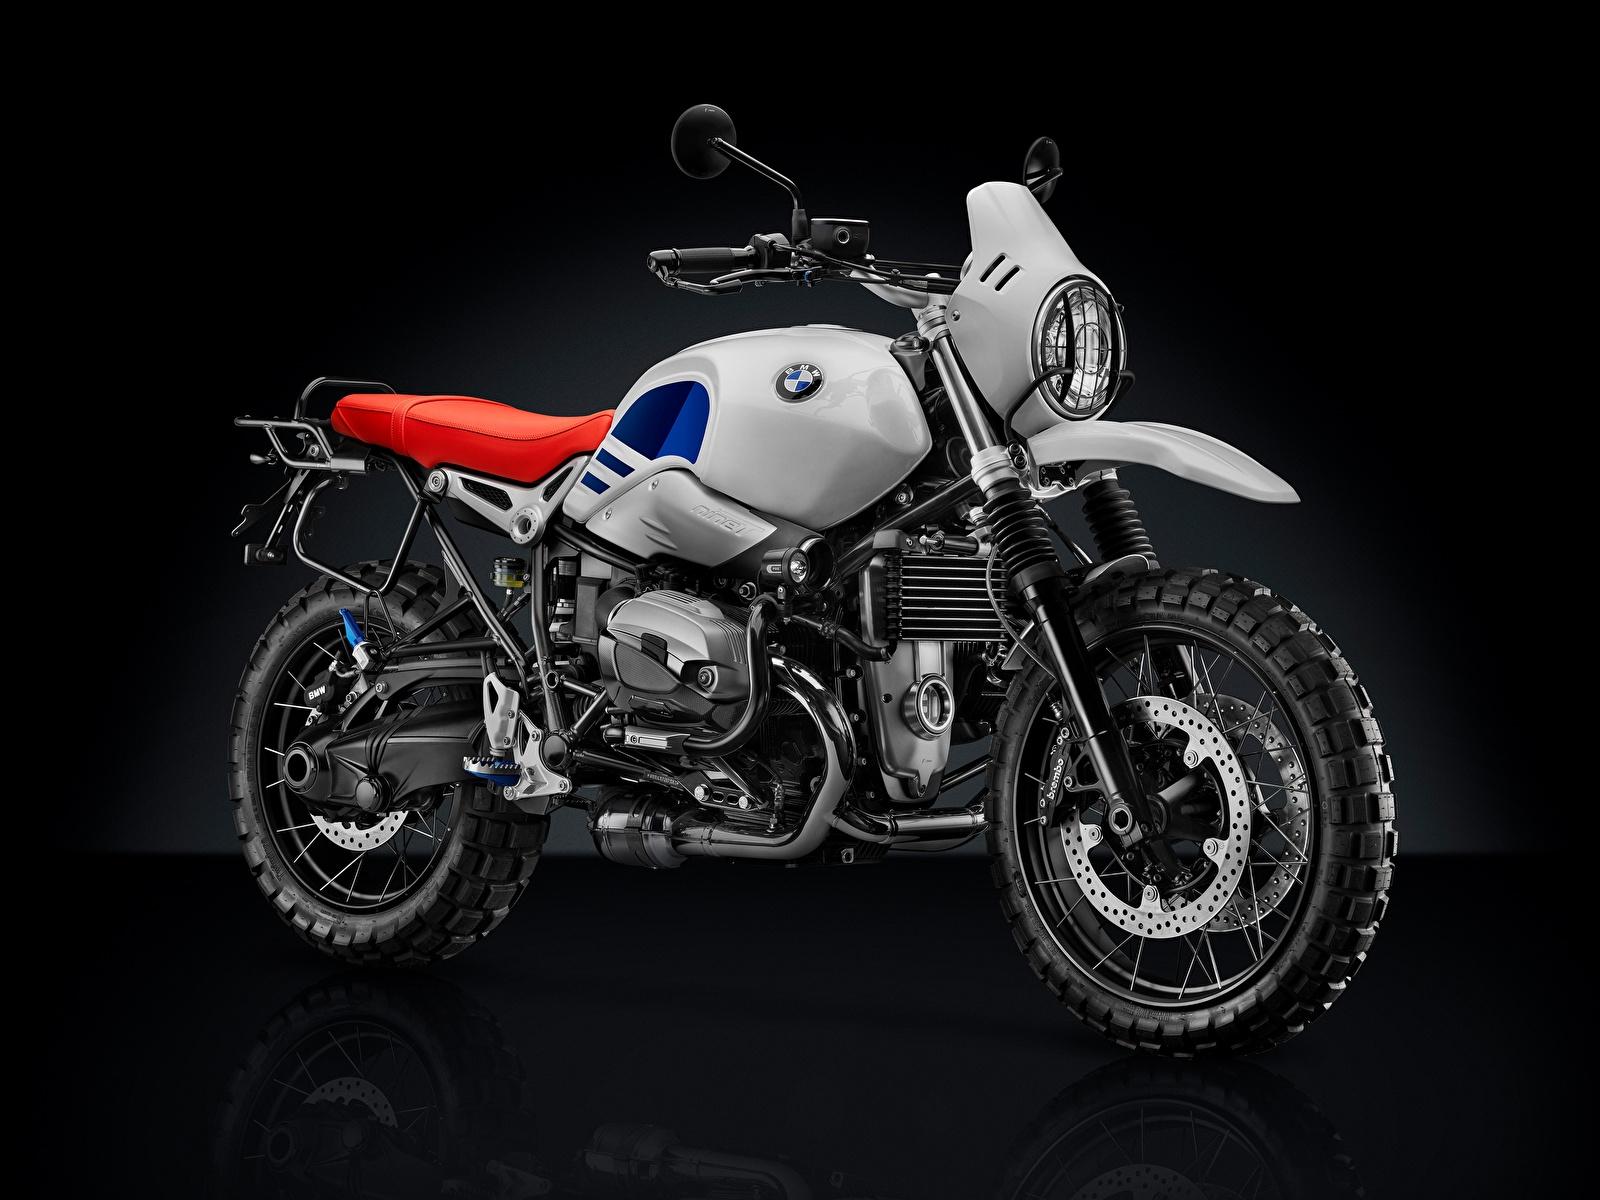 Обои для рабочего стола БМВ 2017-18 R nineT Urban G-S мотоцикл на черном фоне 1600x1200 BMW - Мотоциклы Мотоциклы Черный фон